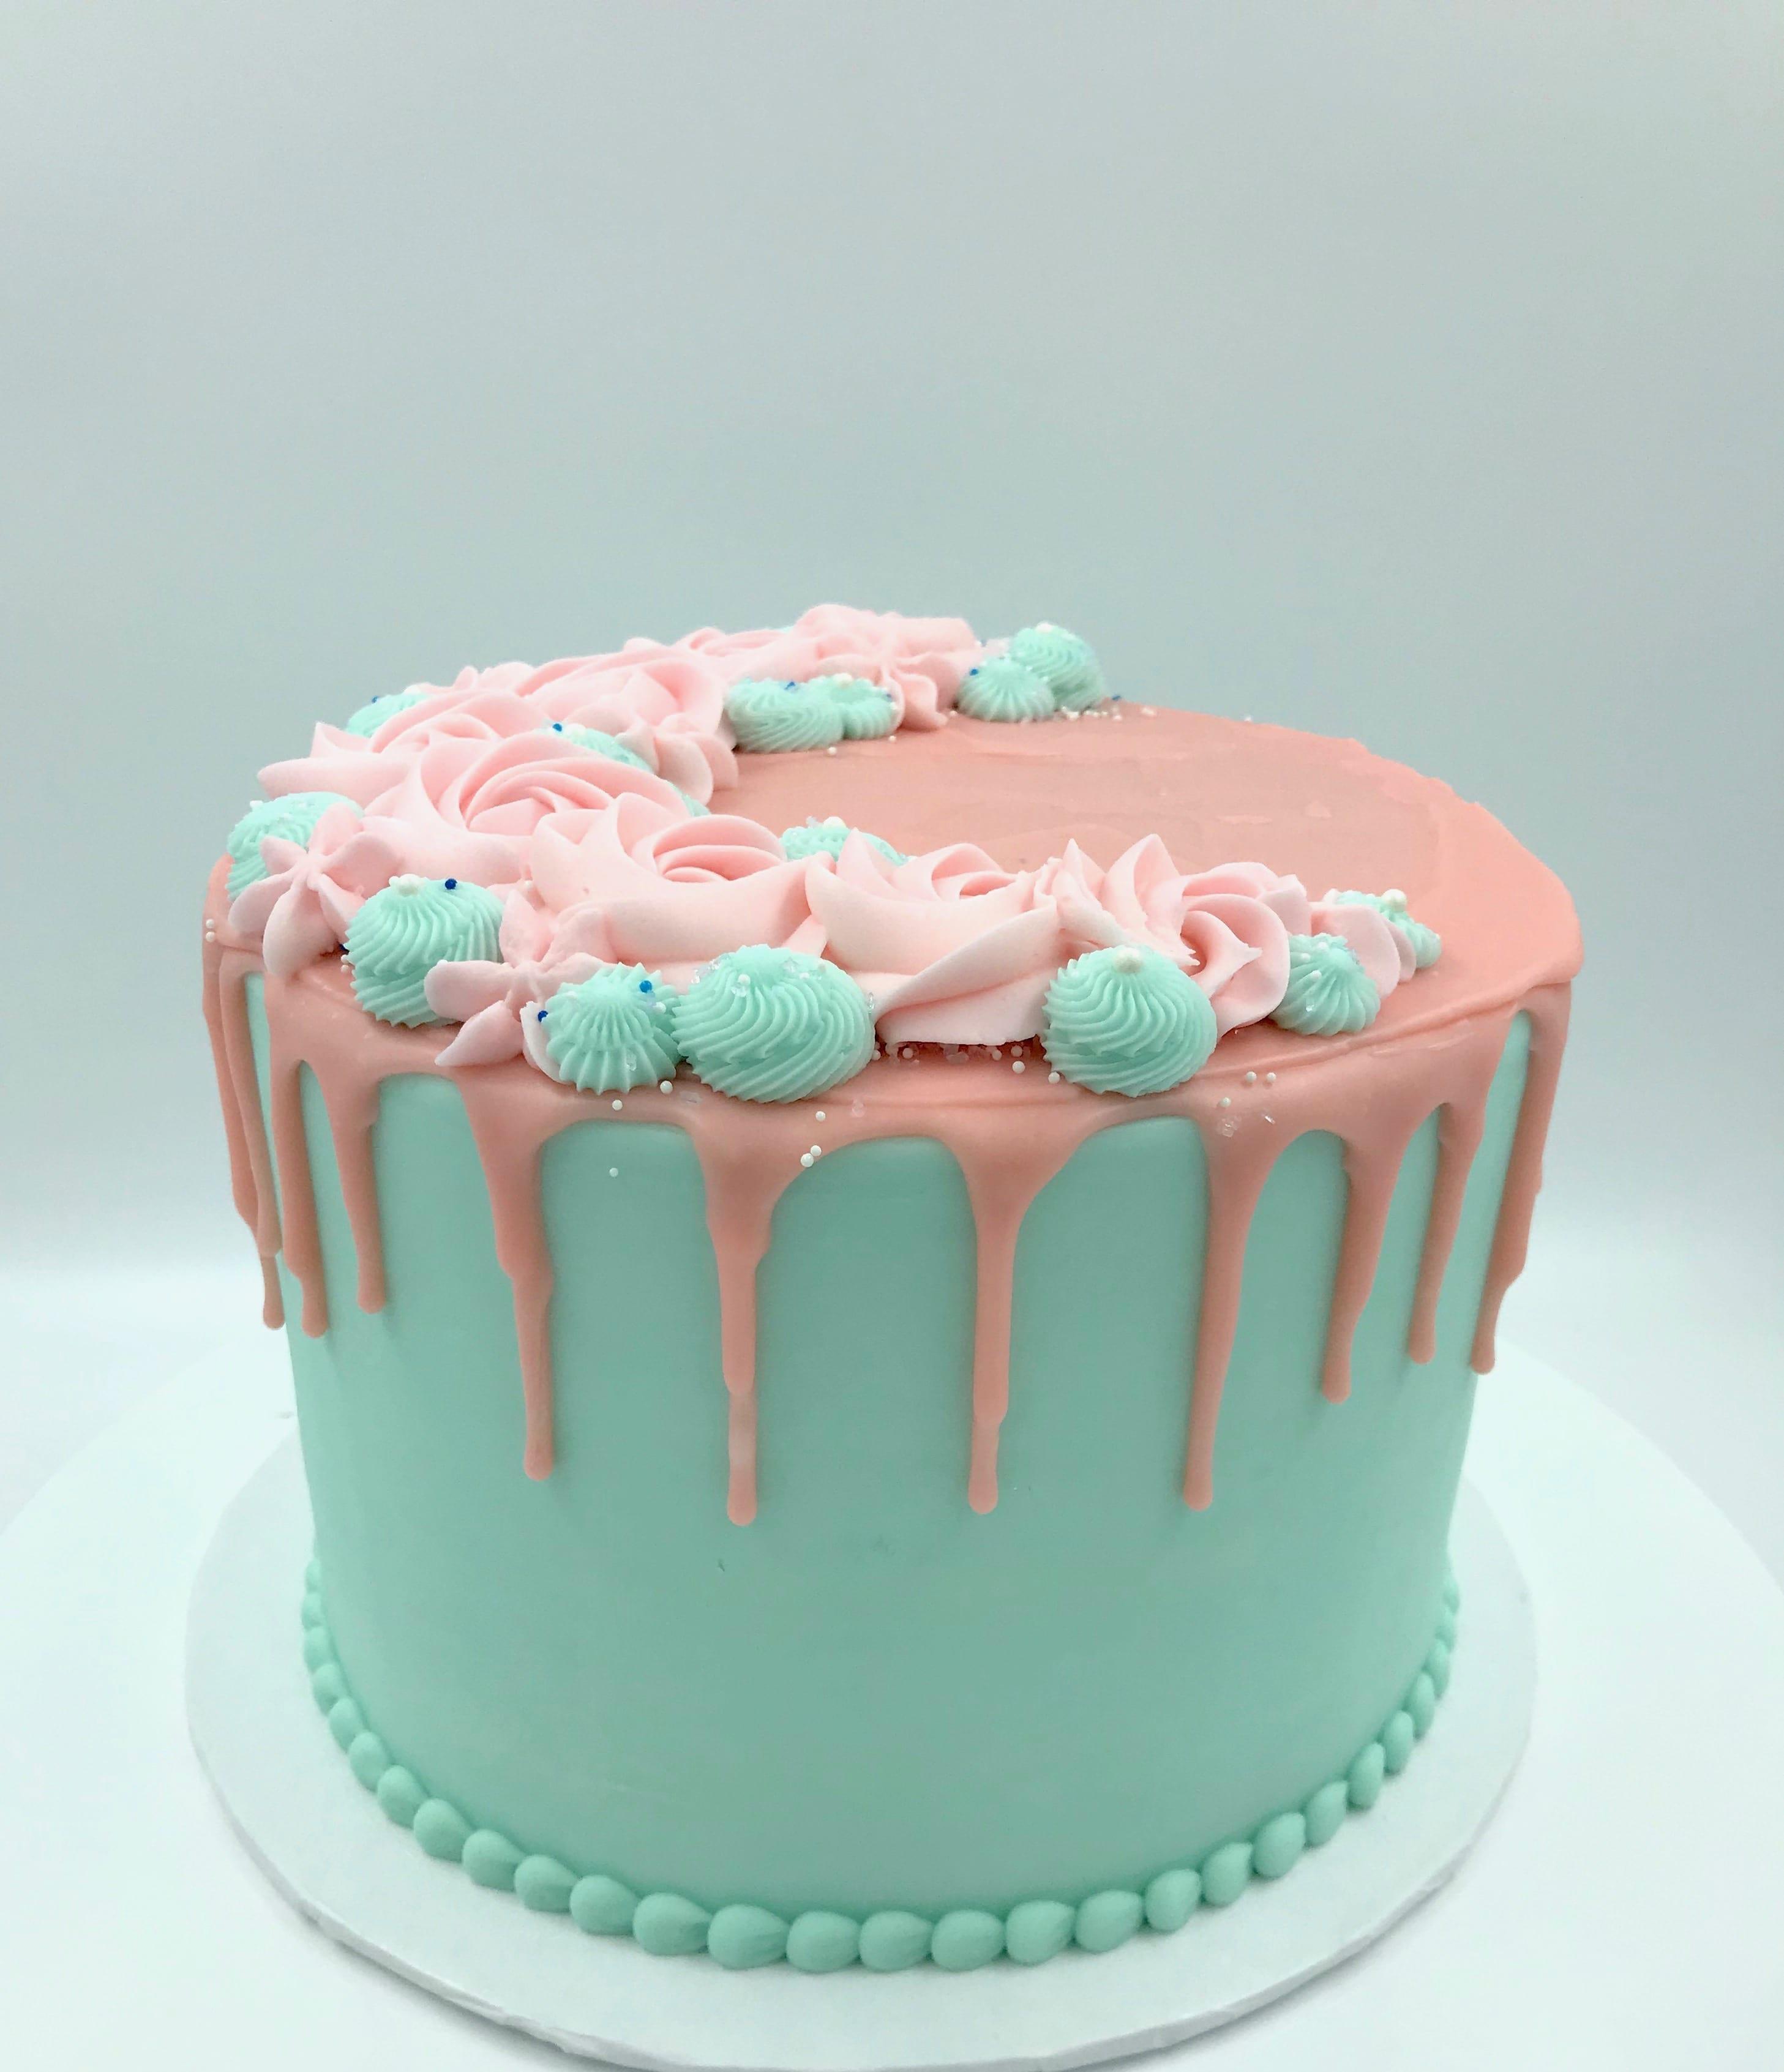 Aqua and Pink Drip Cake   3 Sweet Girls Cakery